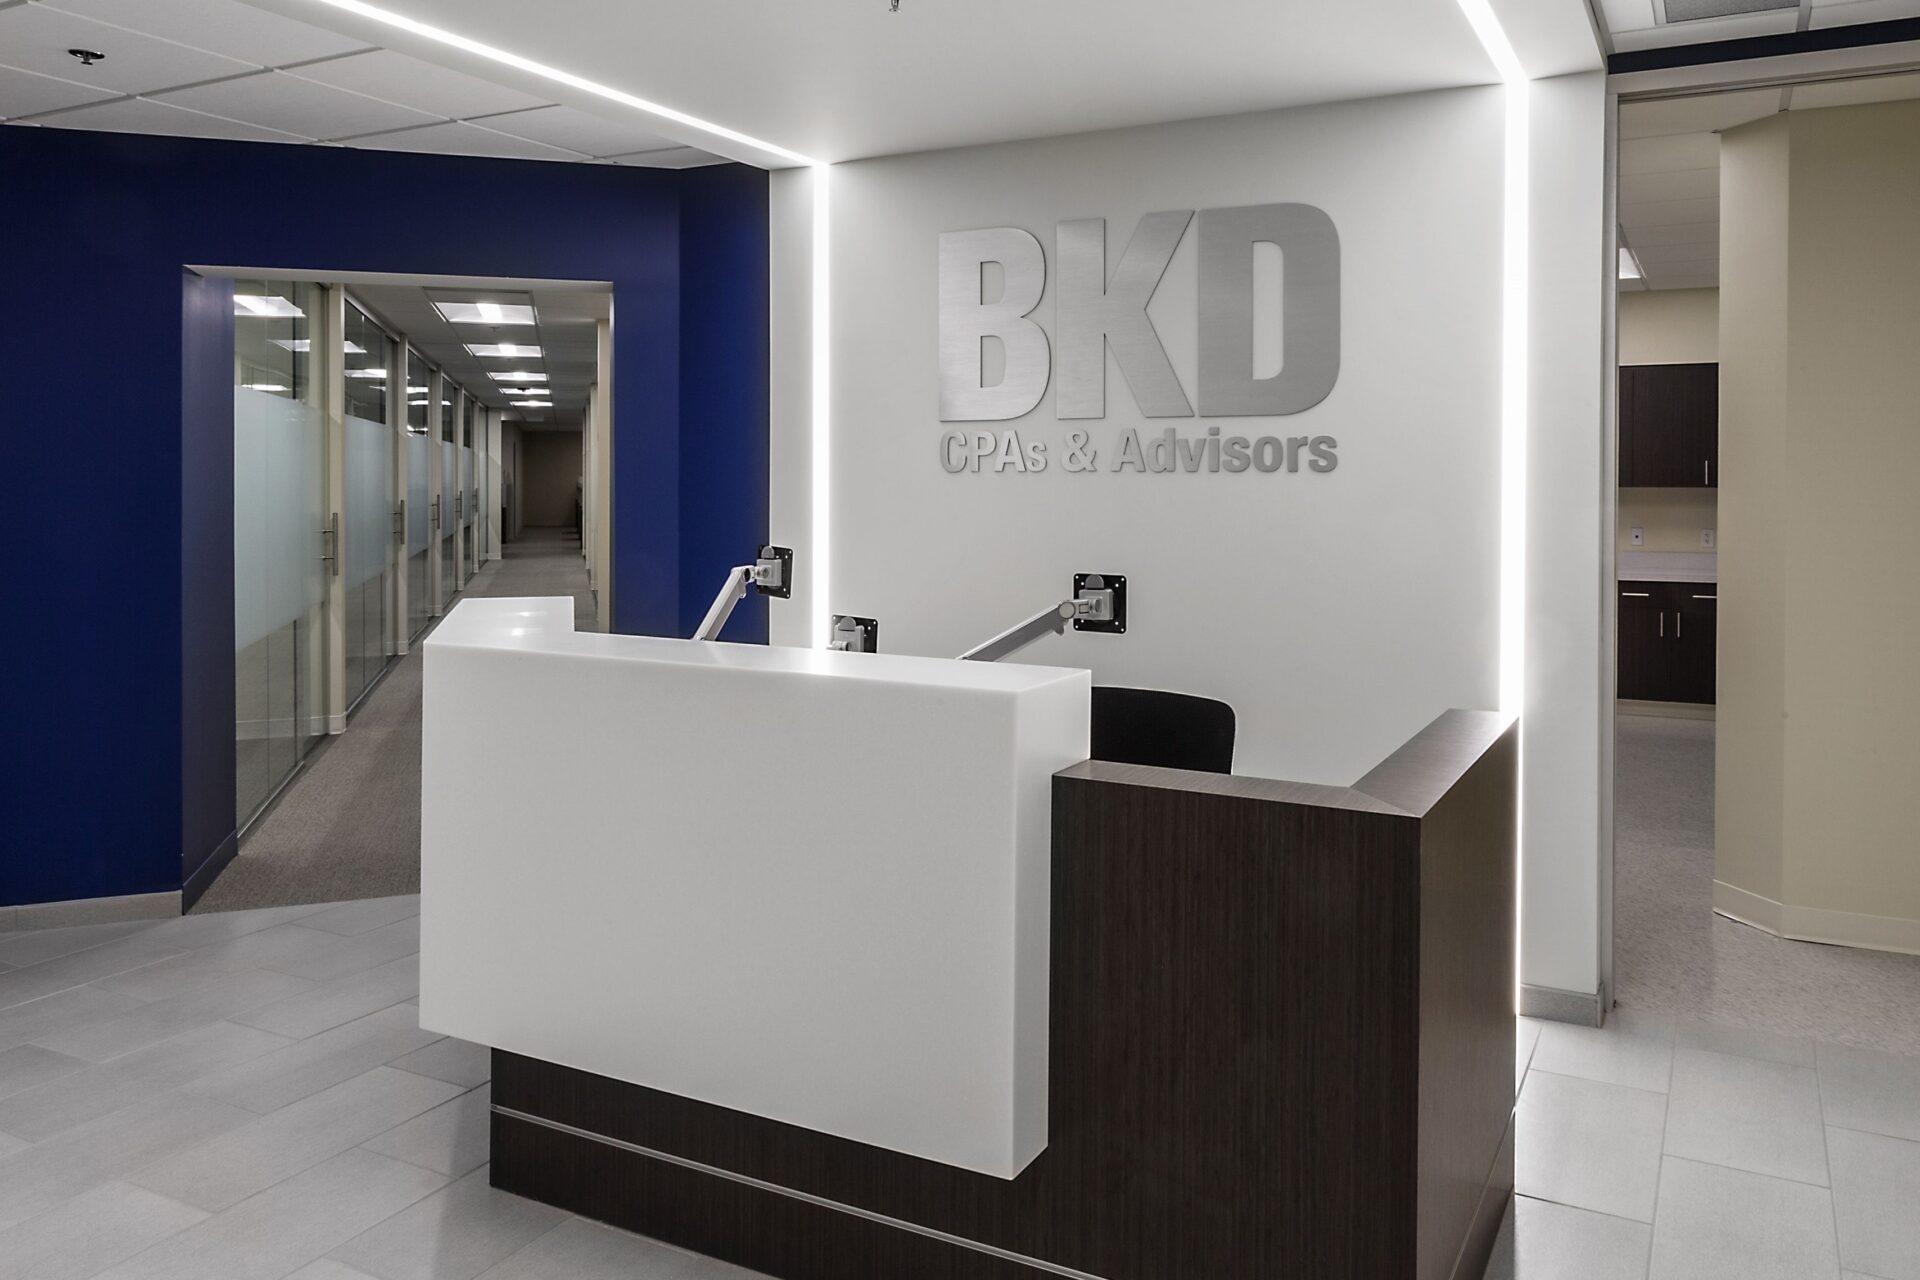 BKD CPAs & Advisors Tenant Improvement